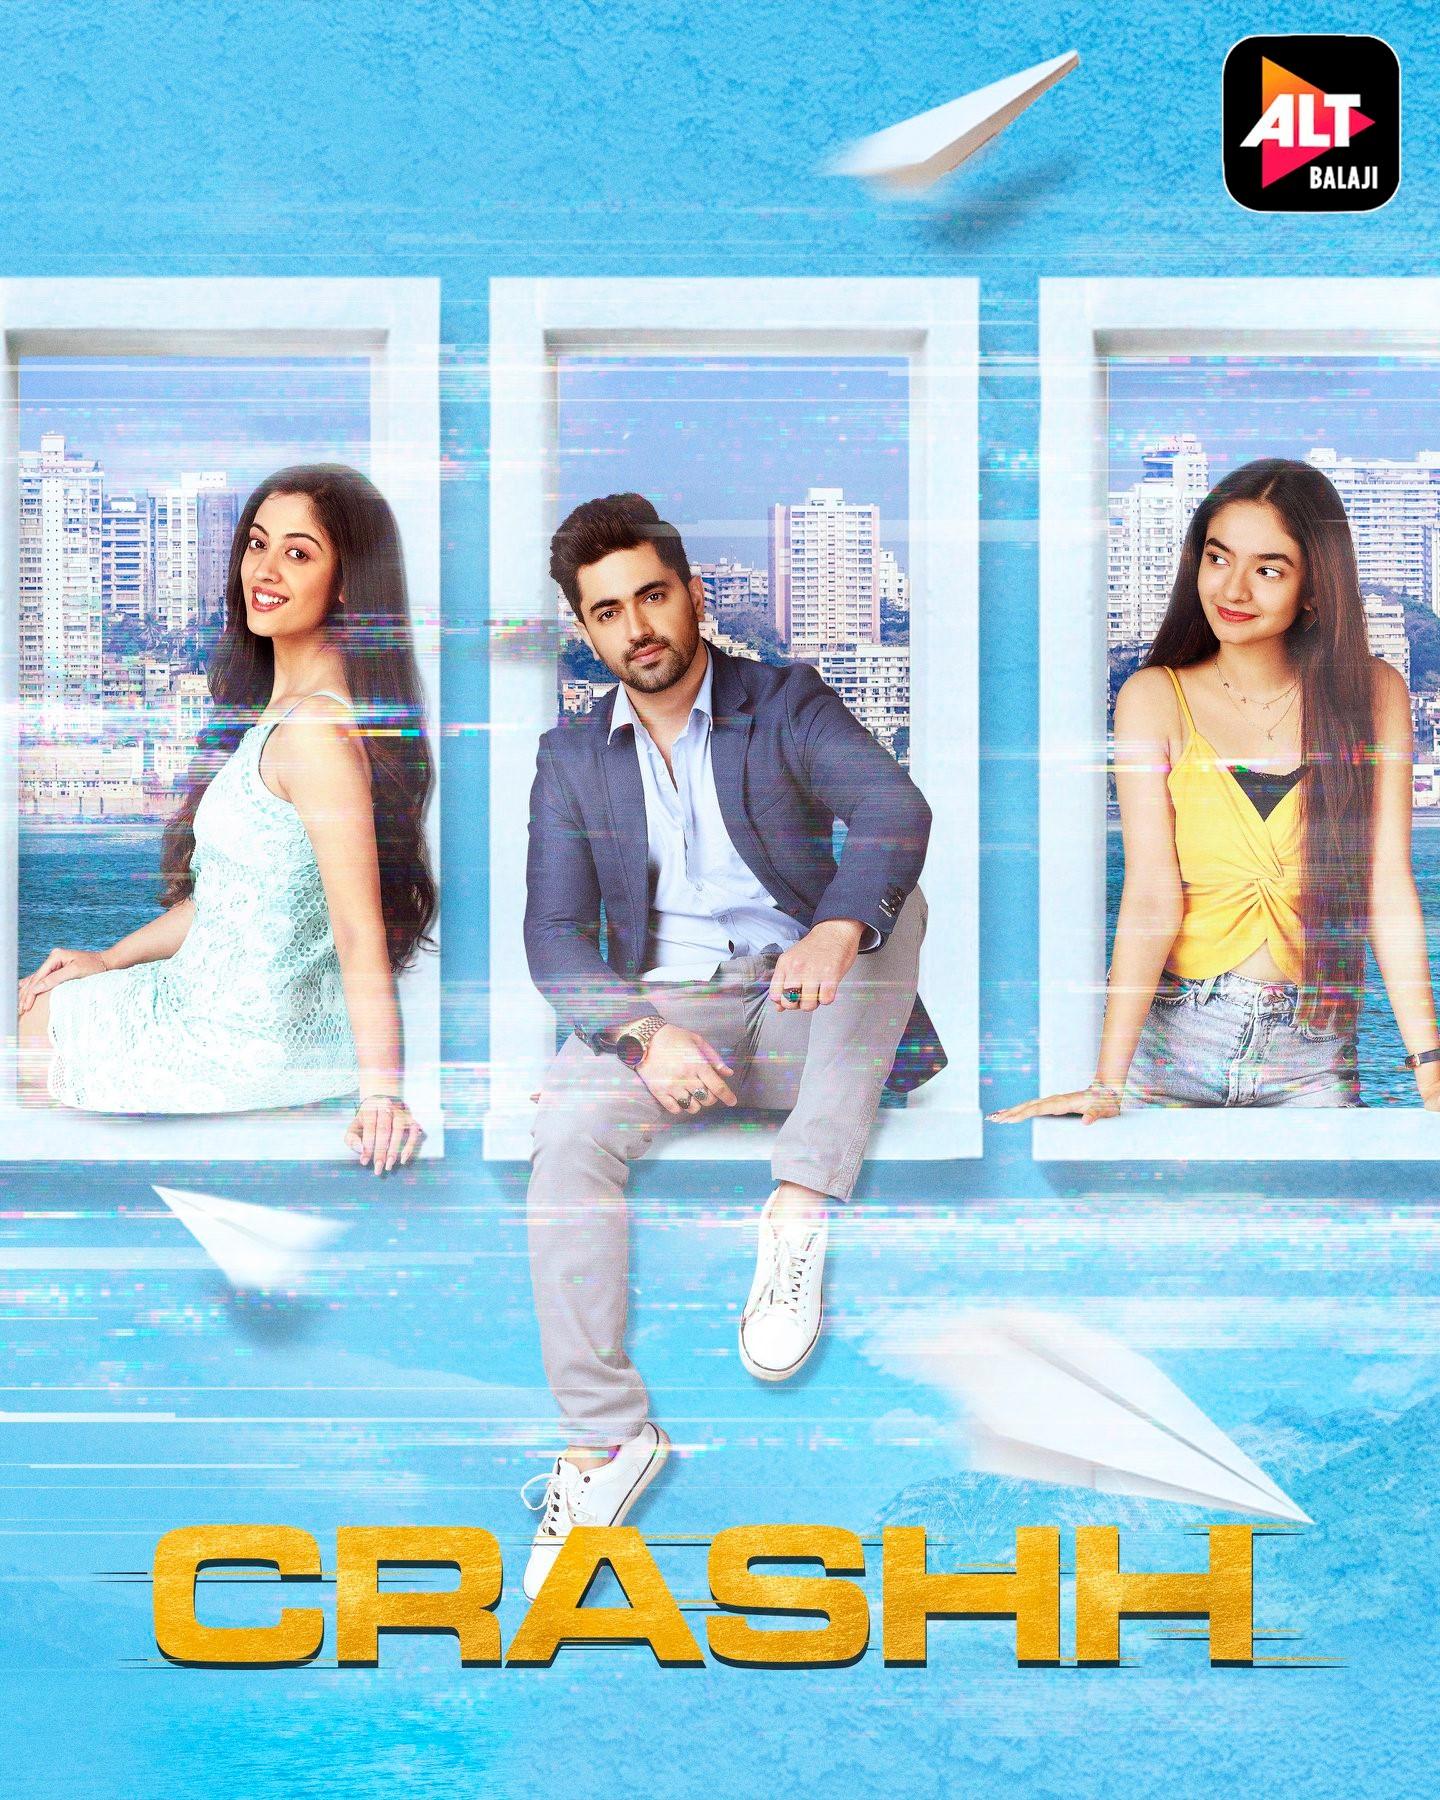 Crashh S01 2021 Hindi ALTBalaji Original Complete Web Series 700MB HDRip Download